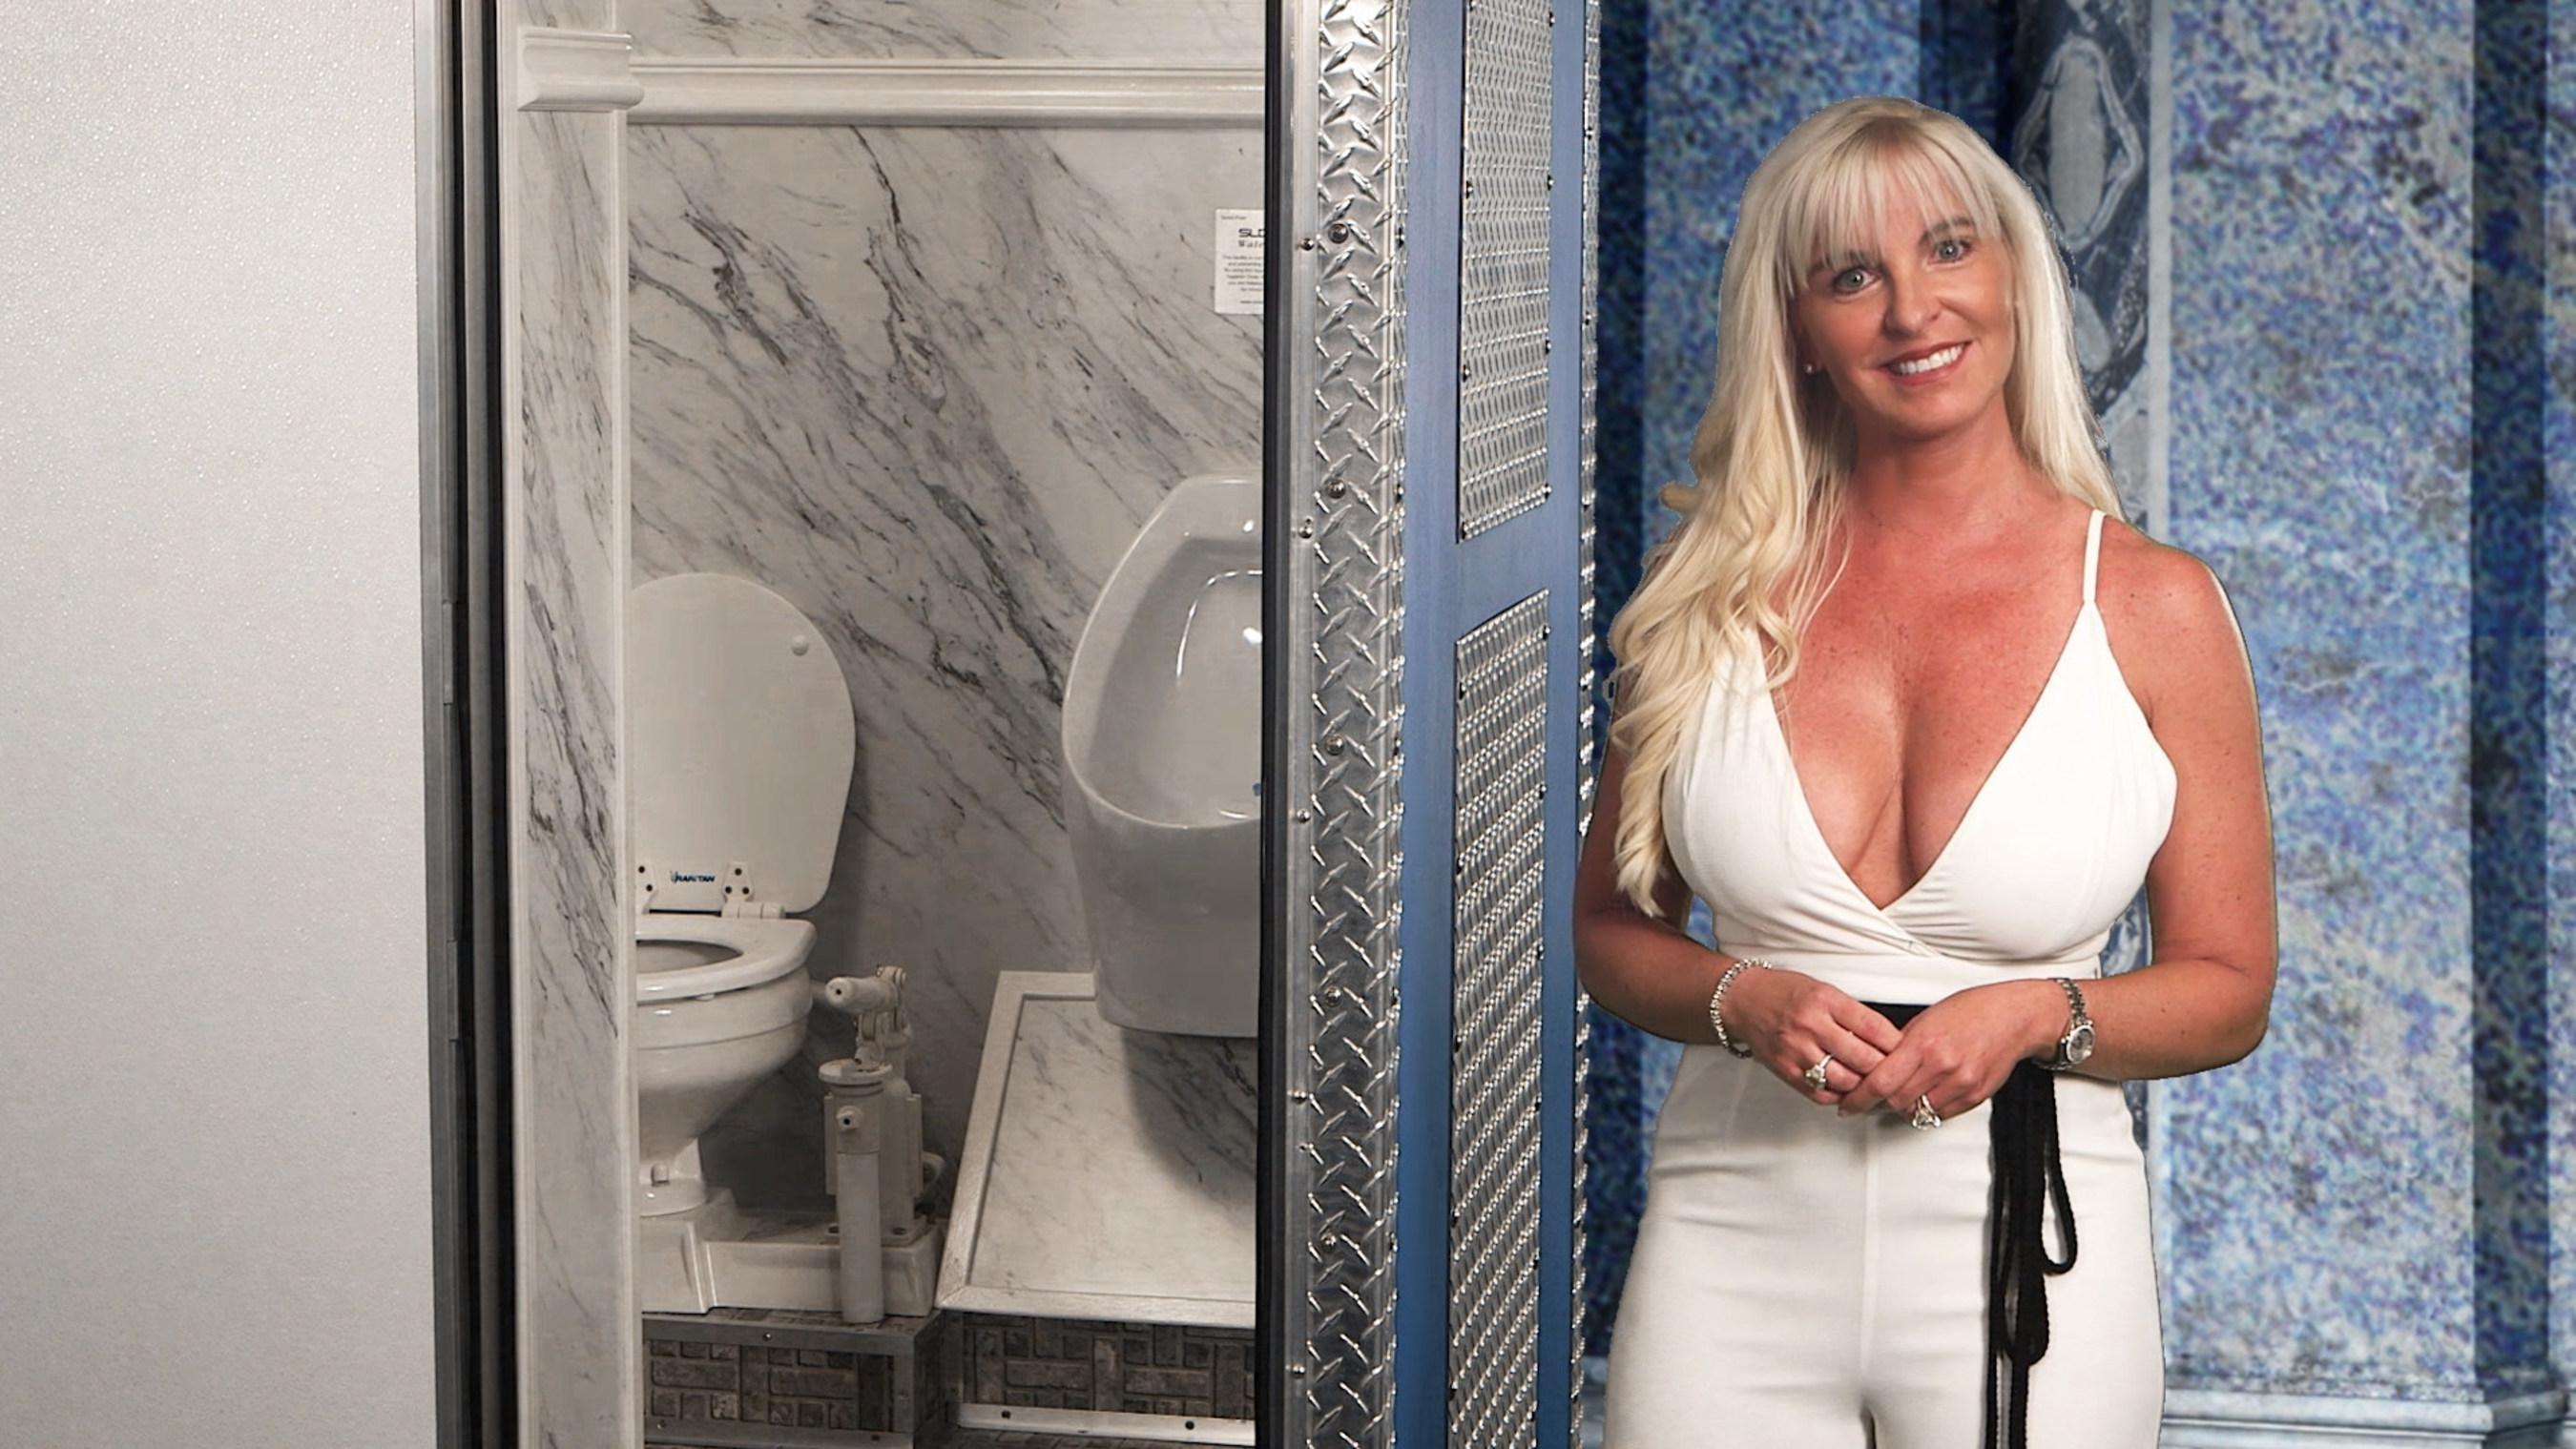 Kimberly Howard & The Waterloo Portable Toilet by CALLAHEAD